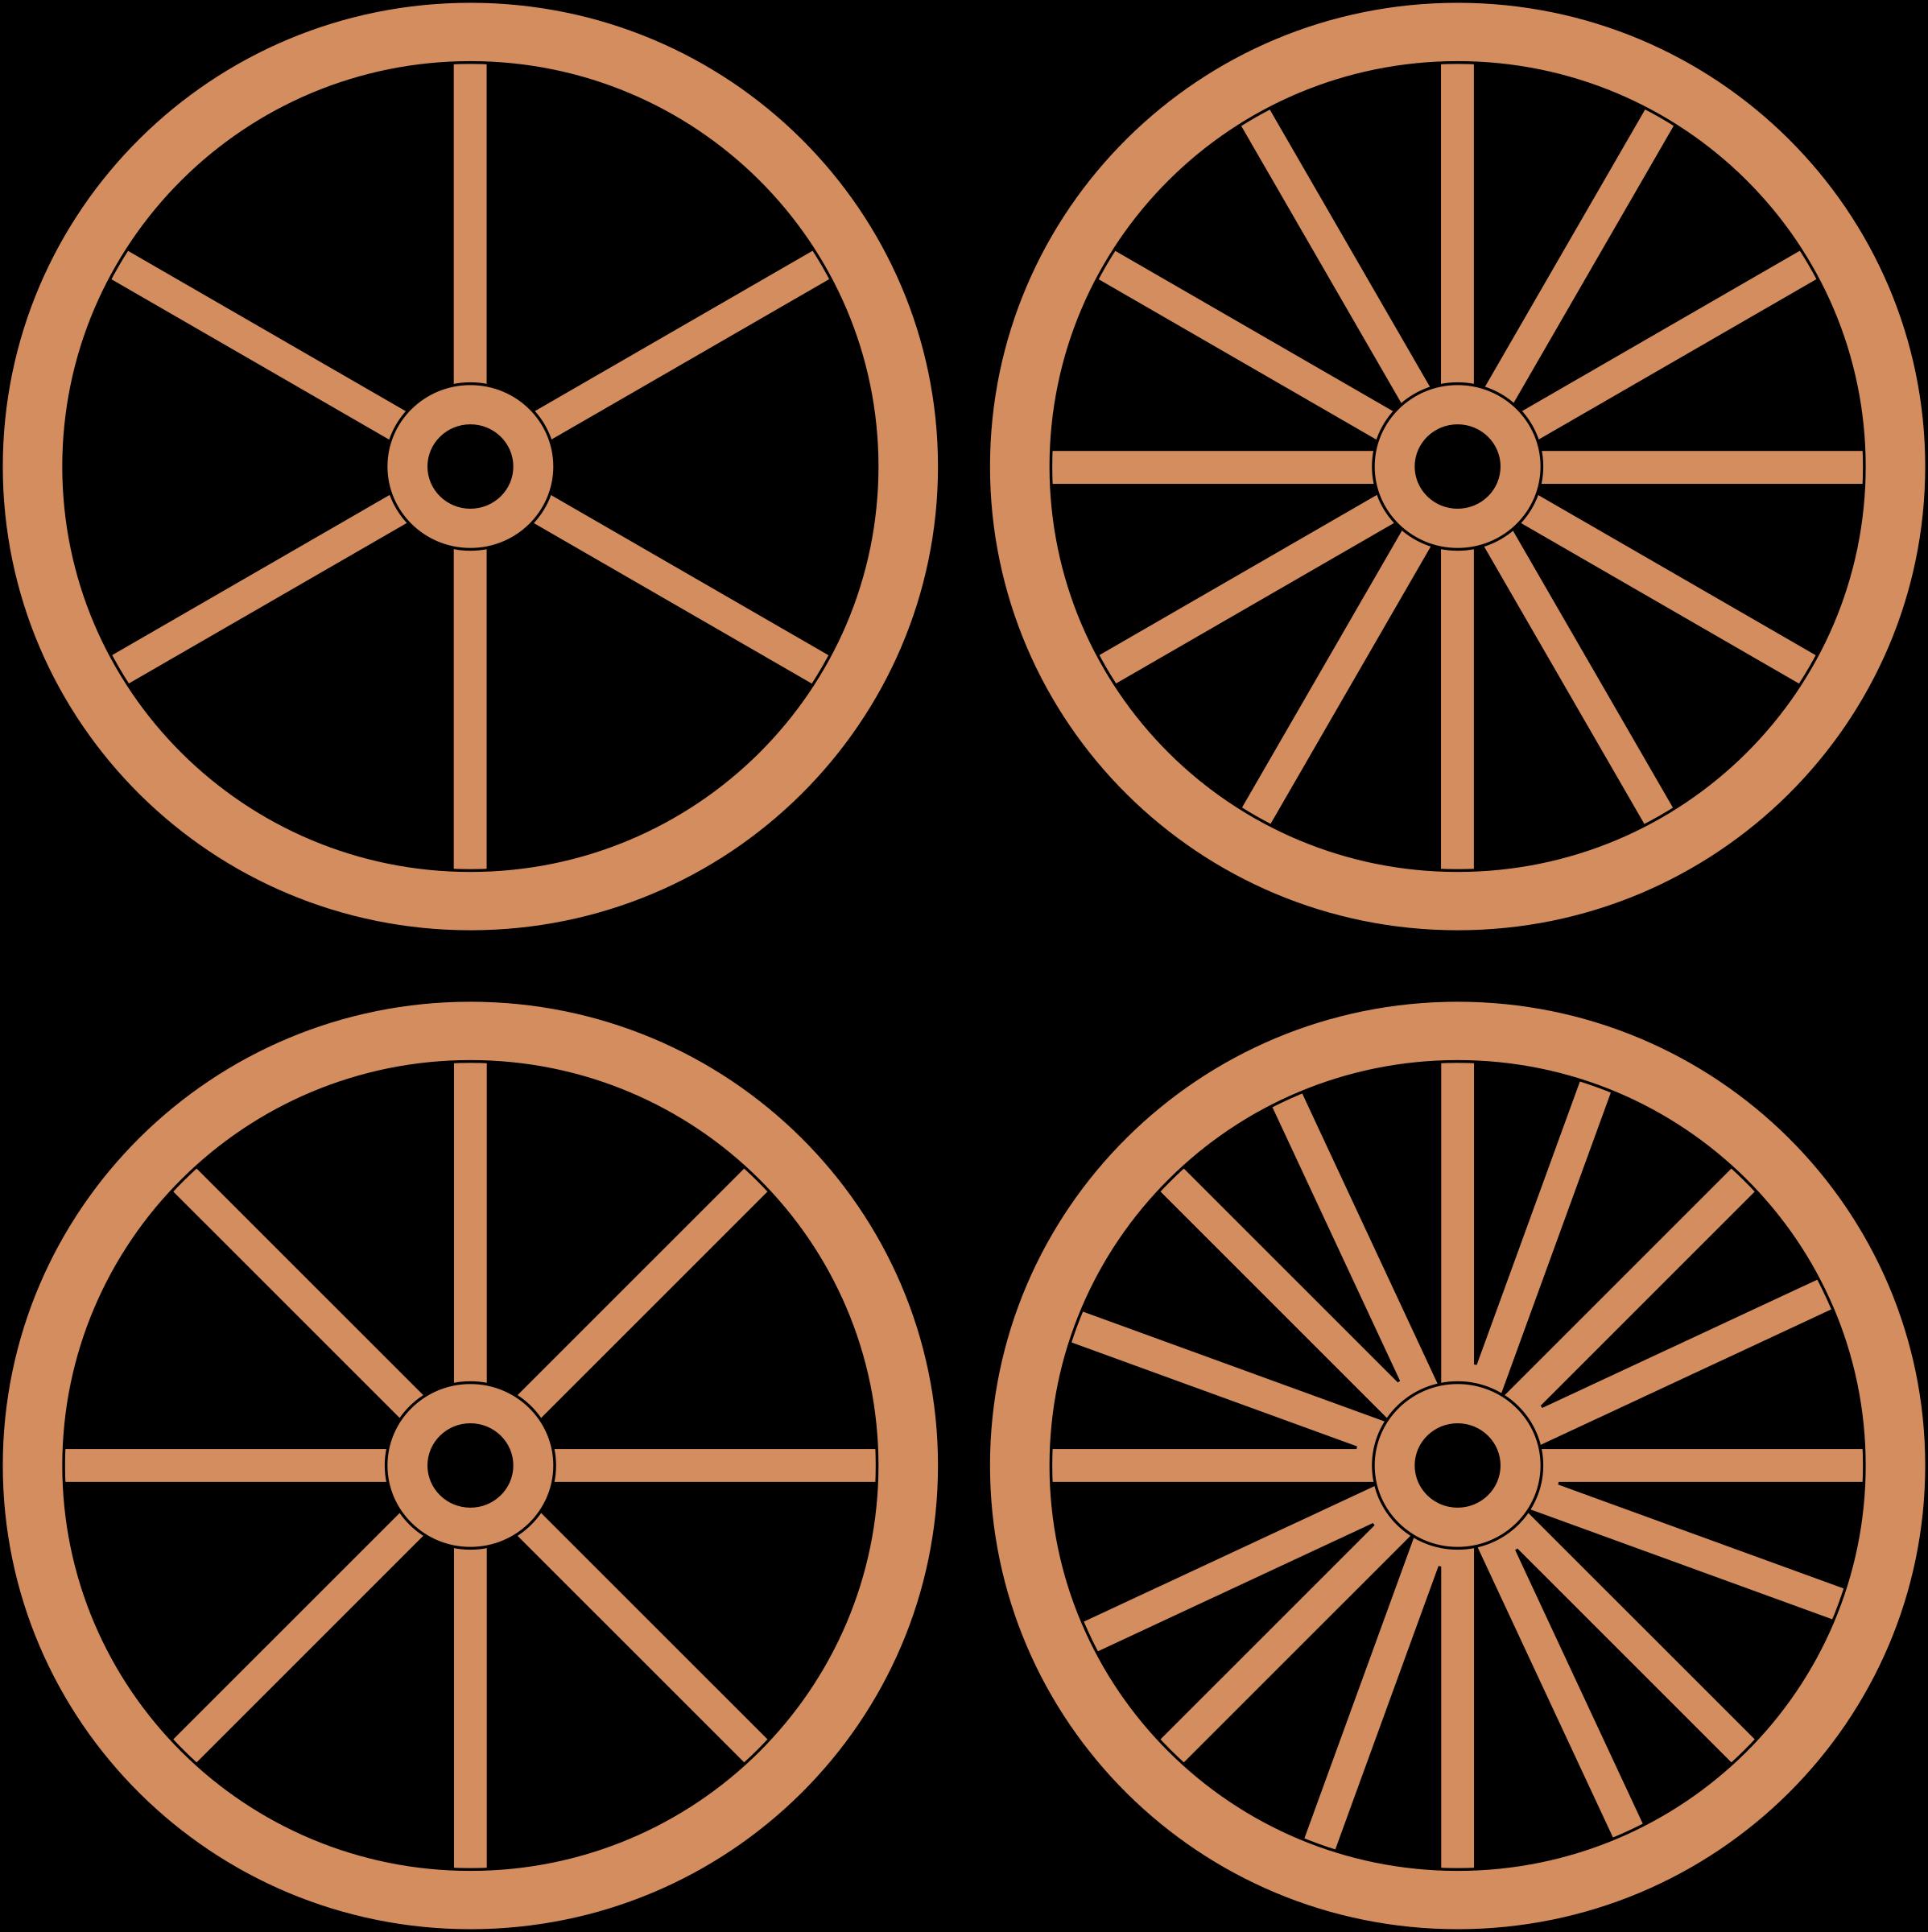 Clipart - Cart or Wagon Wheels